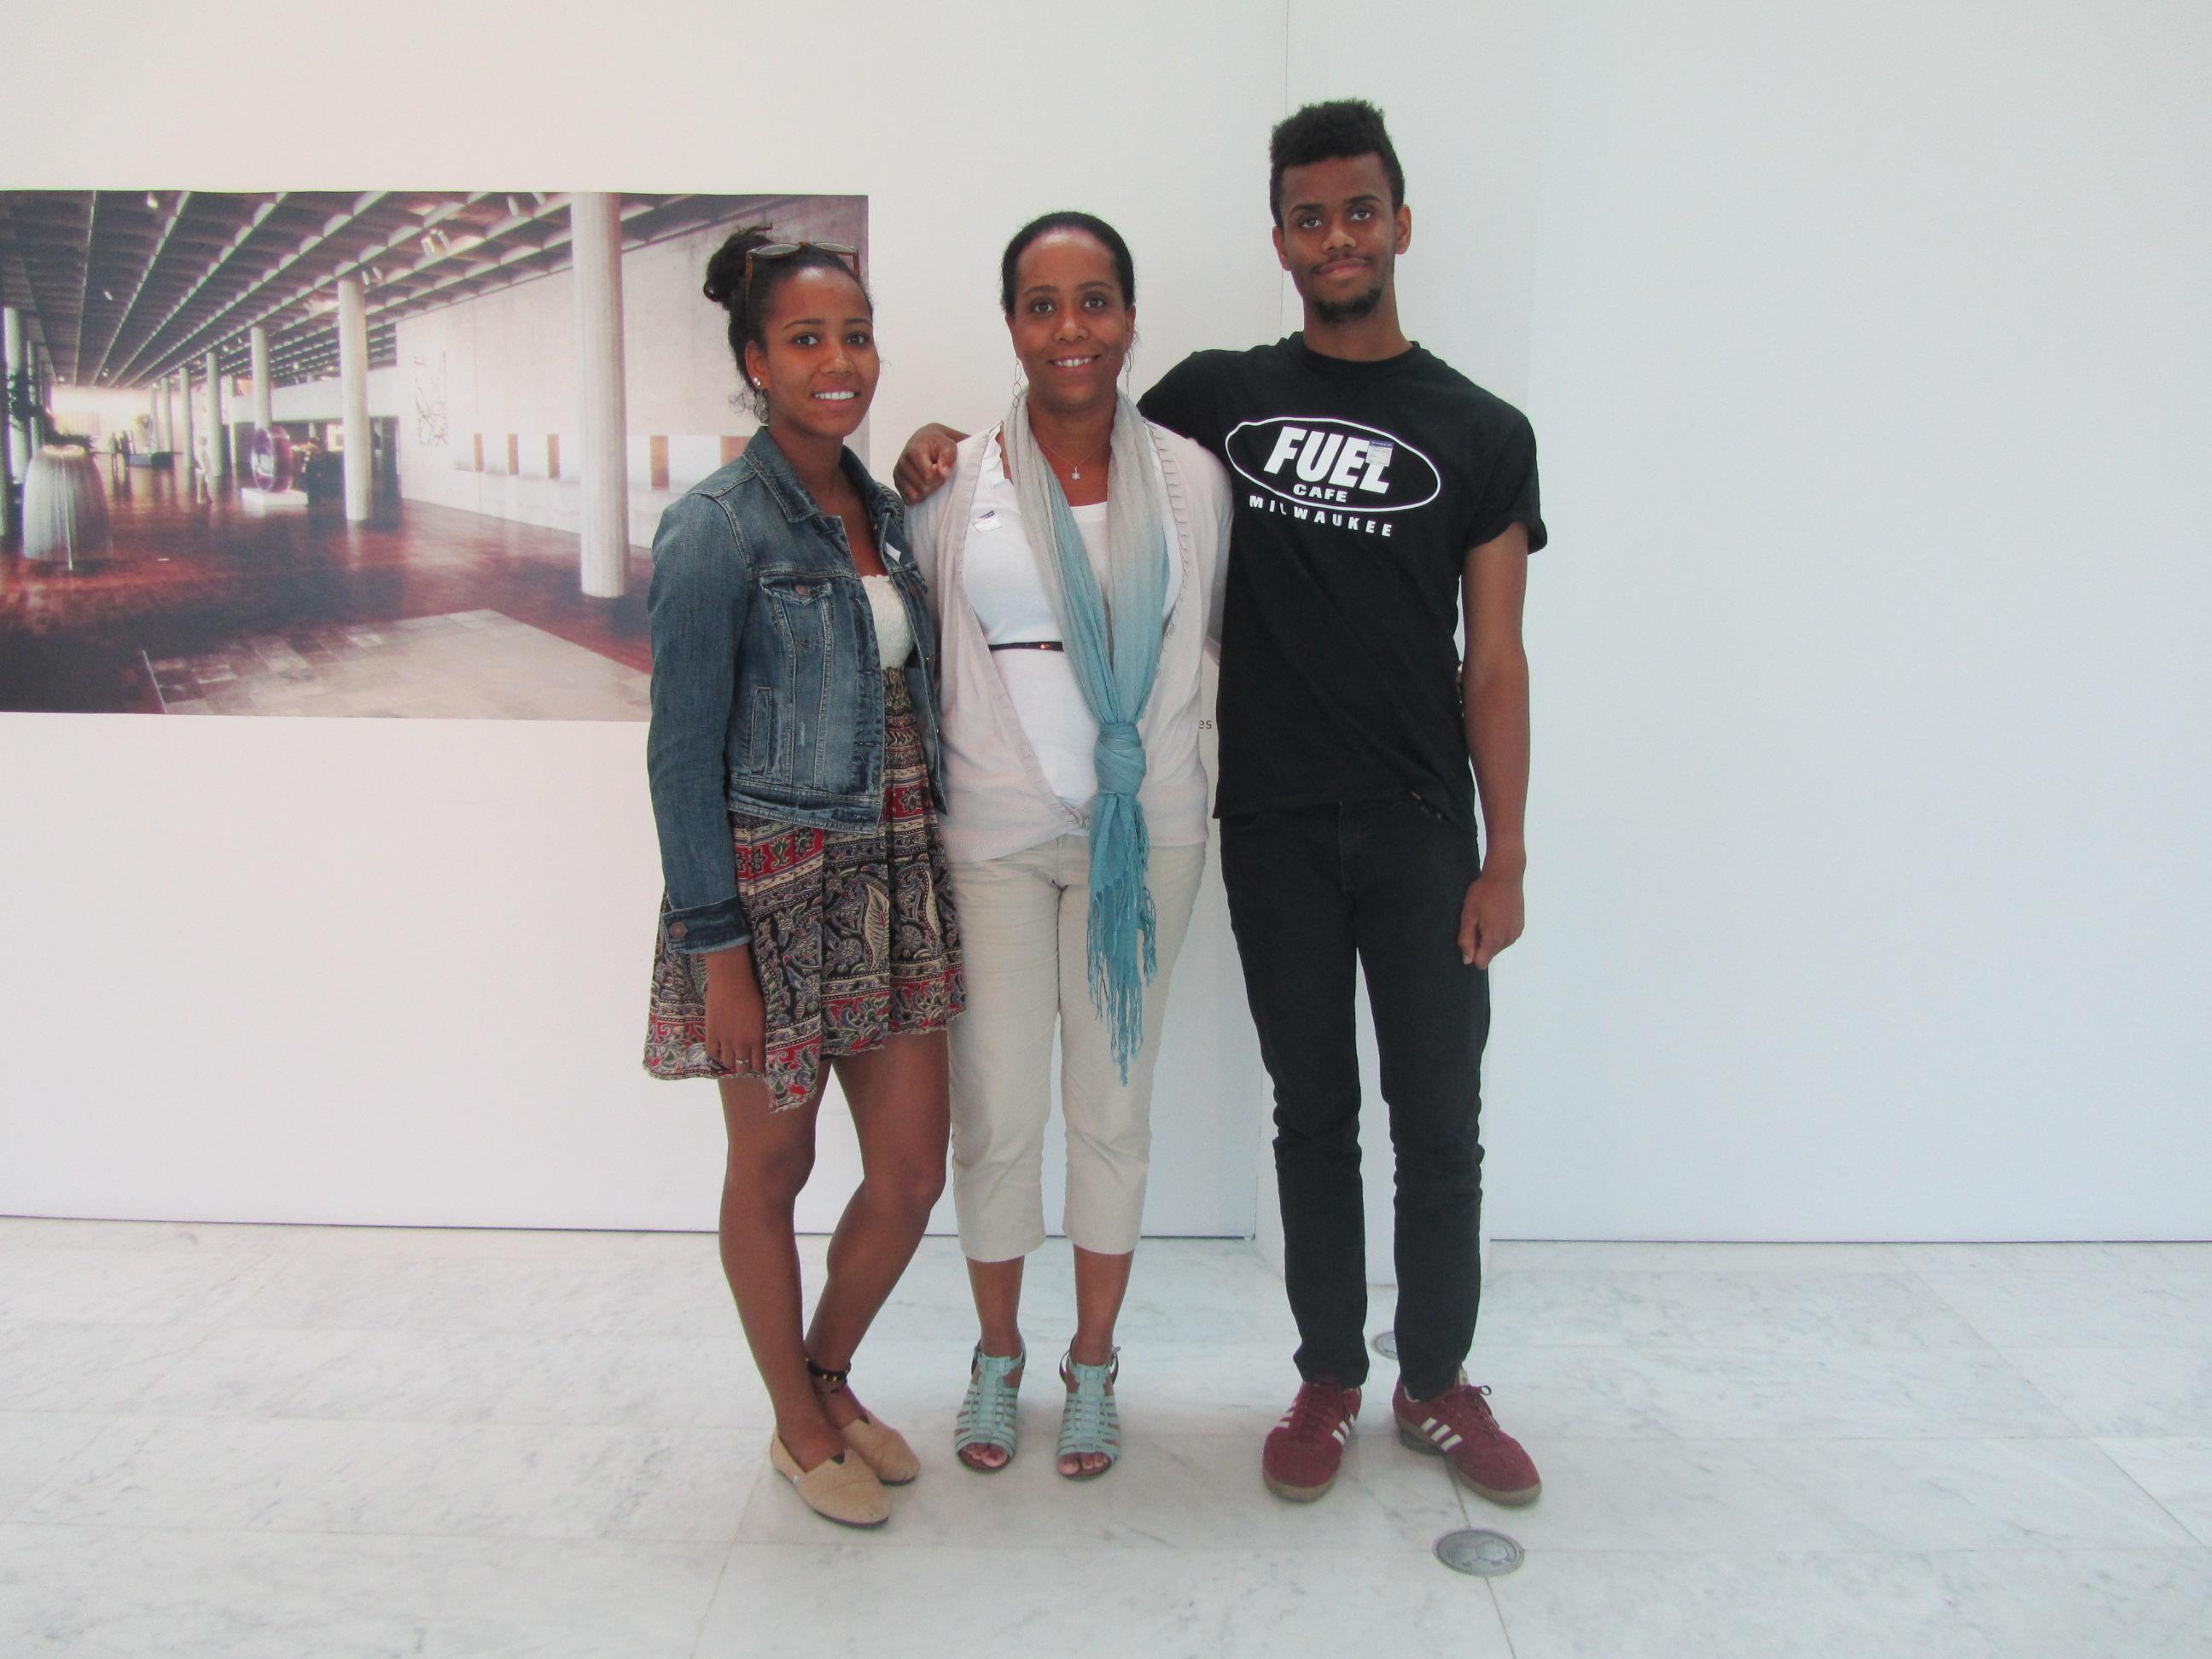 Kai Gardner-Mishlove, Bechane Tendai Cole and Jnana Martin. Photo by the author